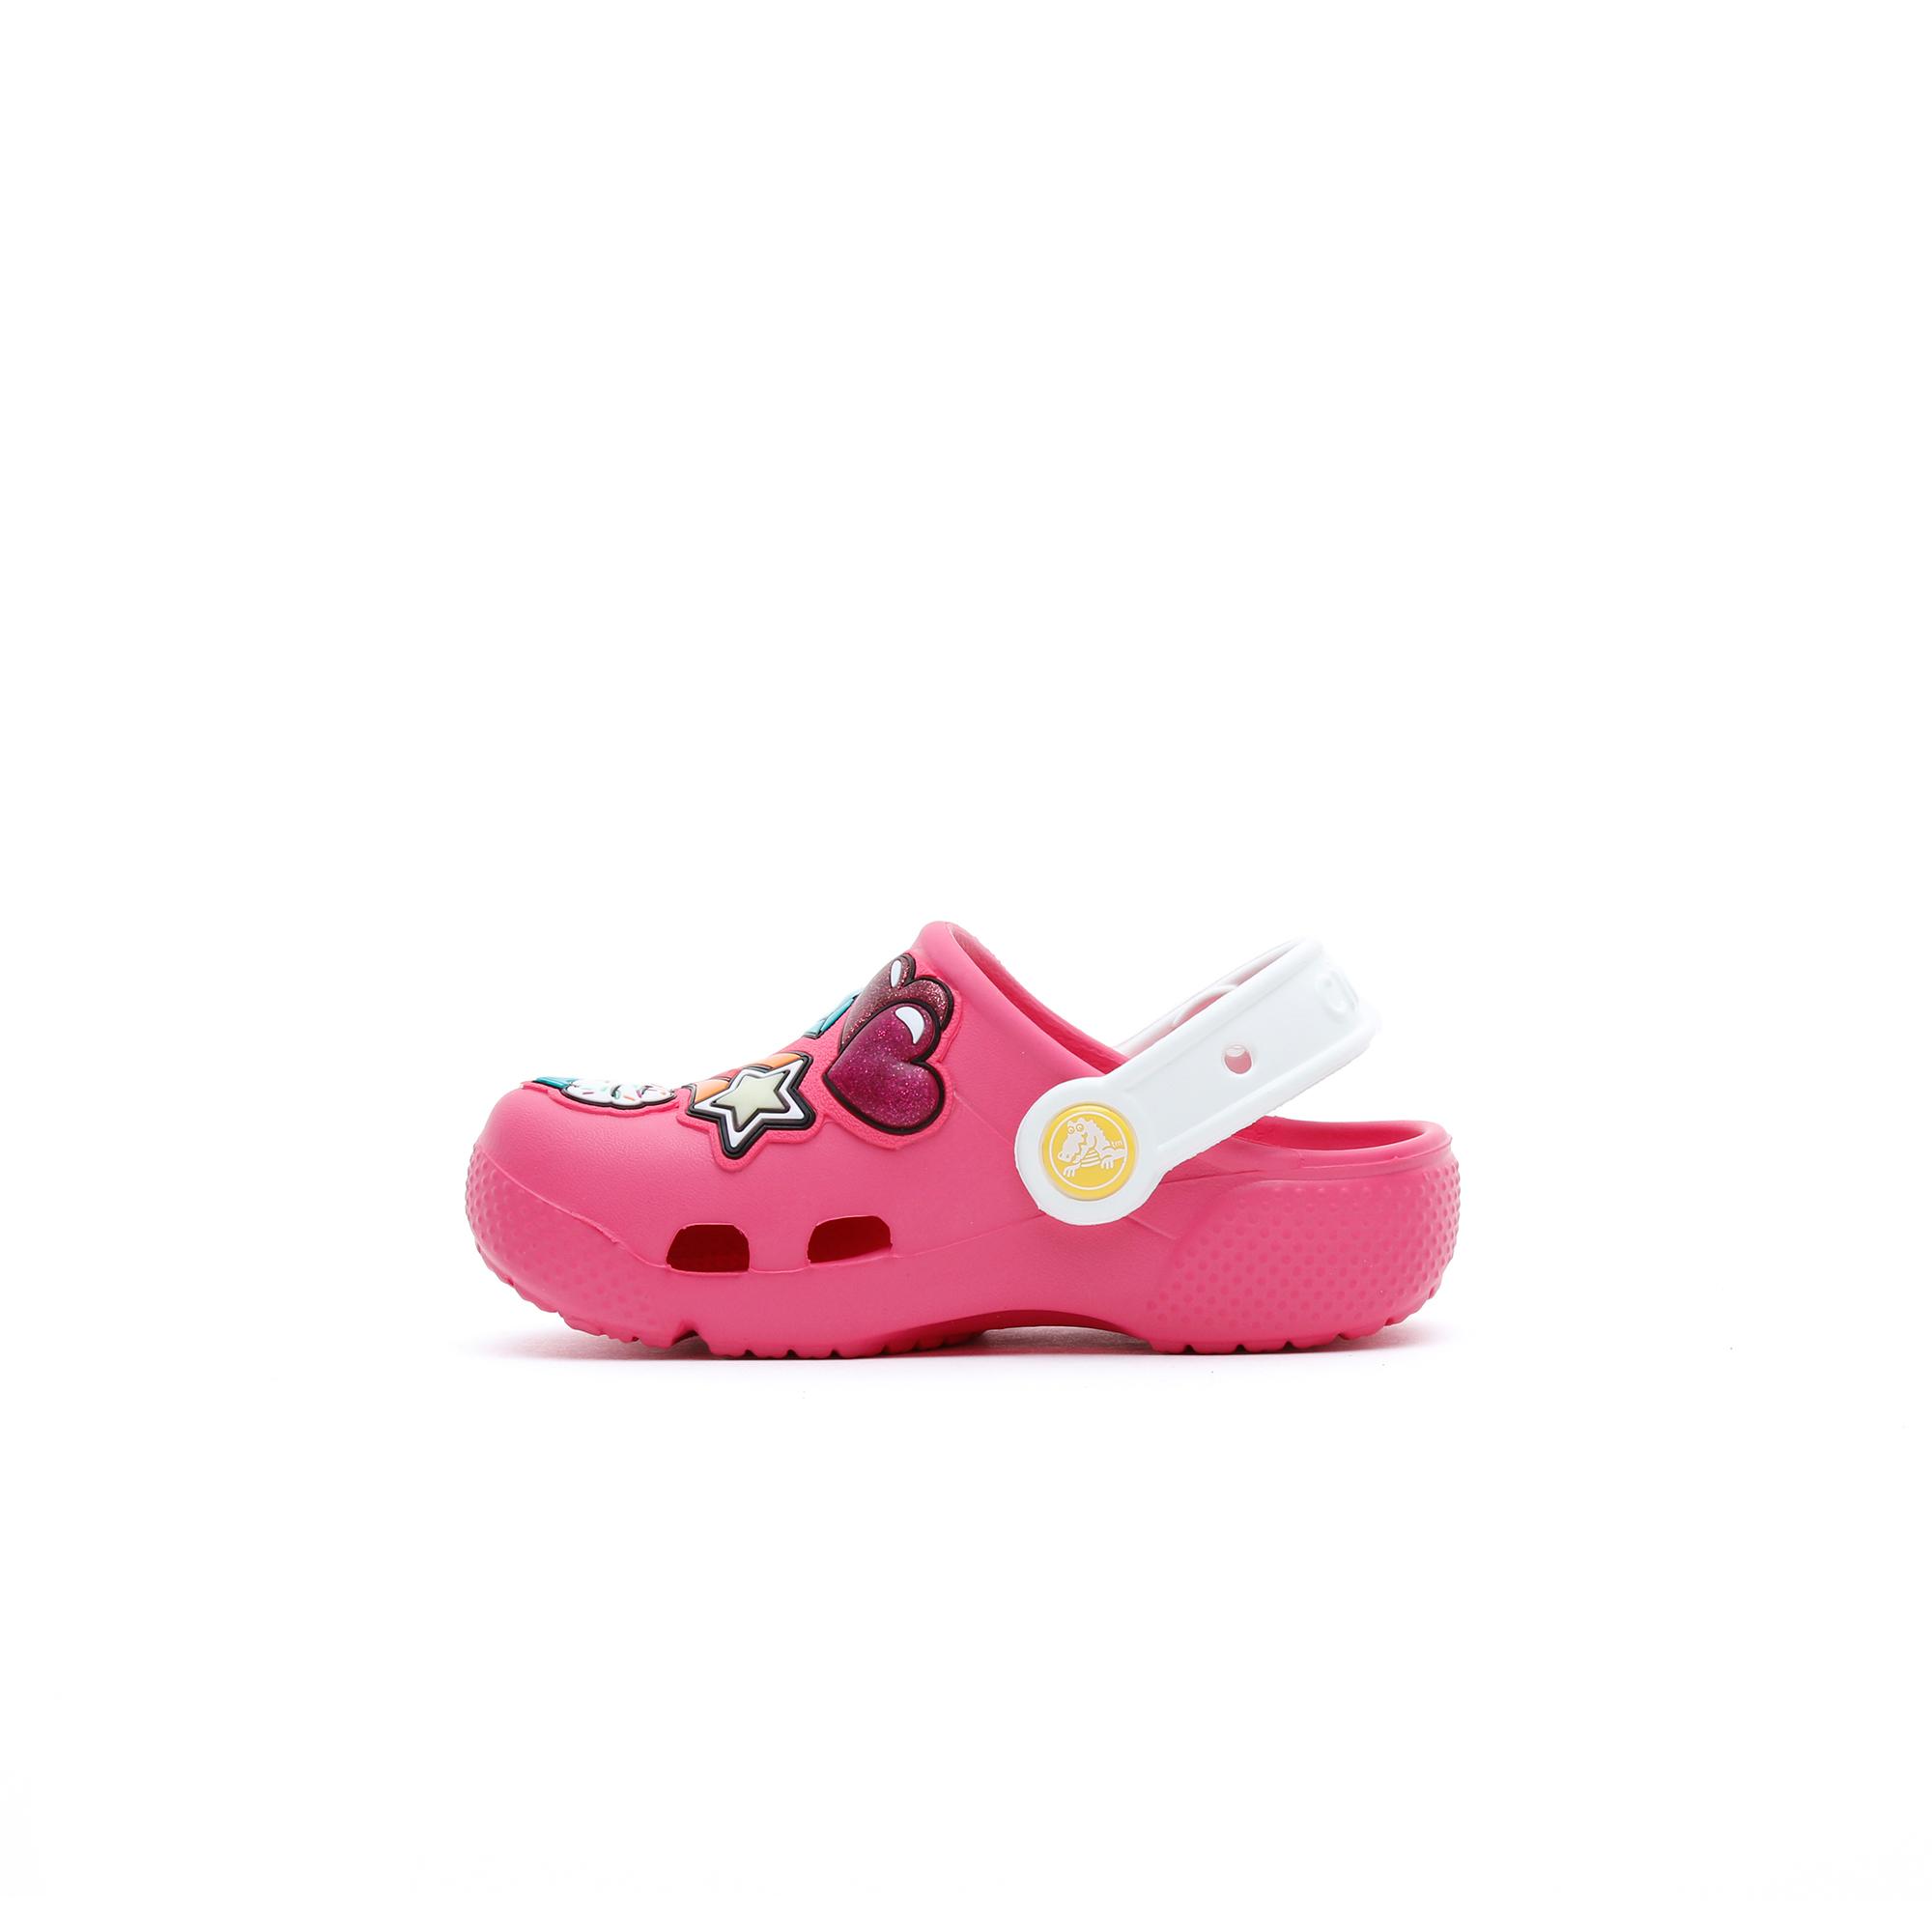 Crocs Crocs Fl Playful Patches Clg K Çocuk Pembe Terlik